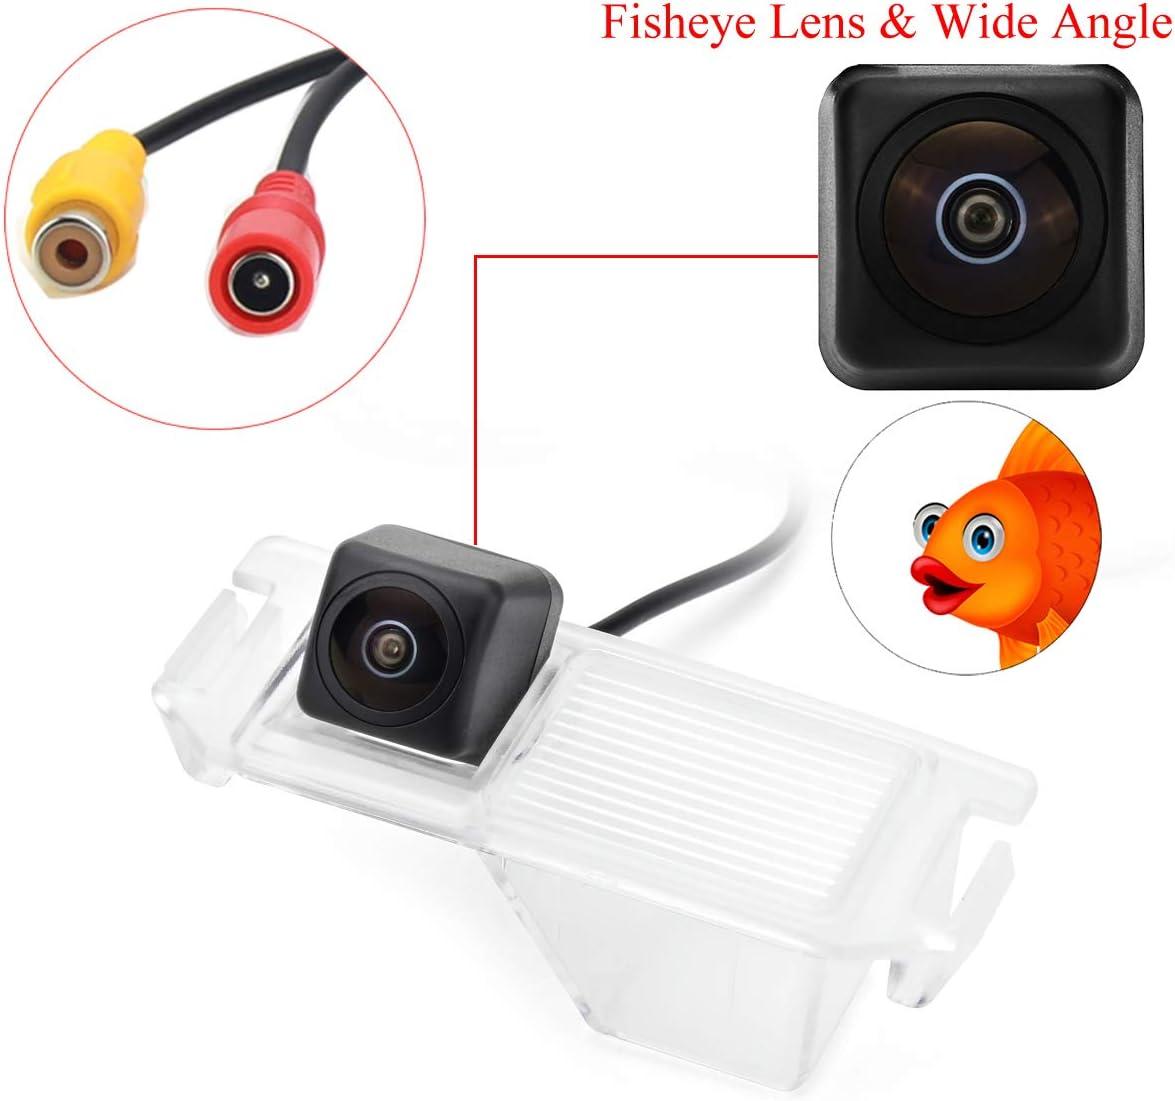 aSATAH Fisheye Lens Car Rear View Camera for Hyundai Elantra Touring//Hyundai i30 //Coupe S3//Tuscani//Tiburon Hyundai Genesis /& Waterproof and Shockproof Reversing Backup Camera Fisheye Lens